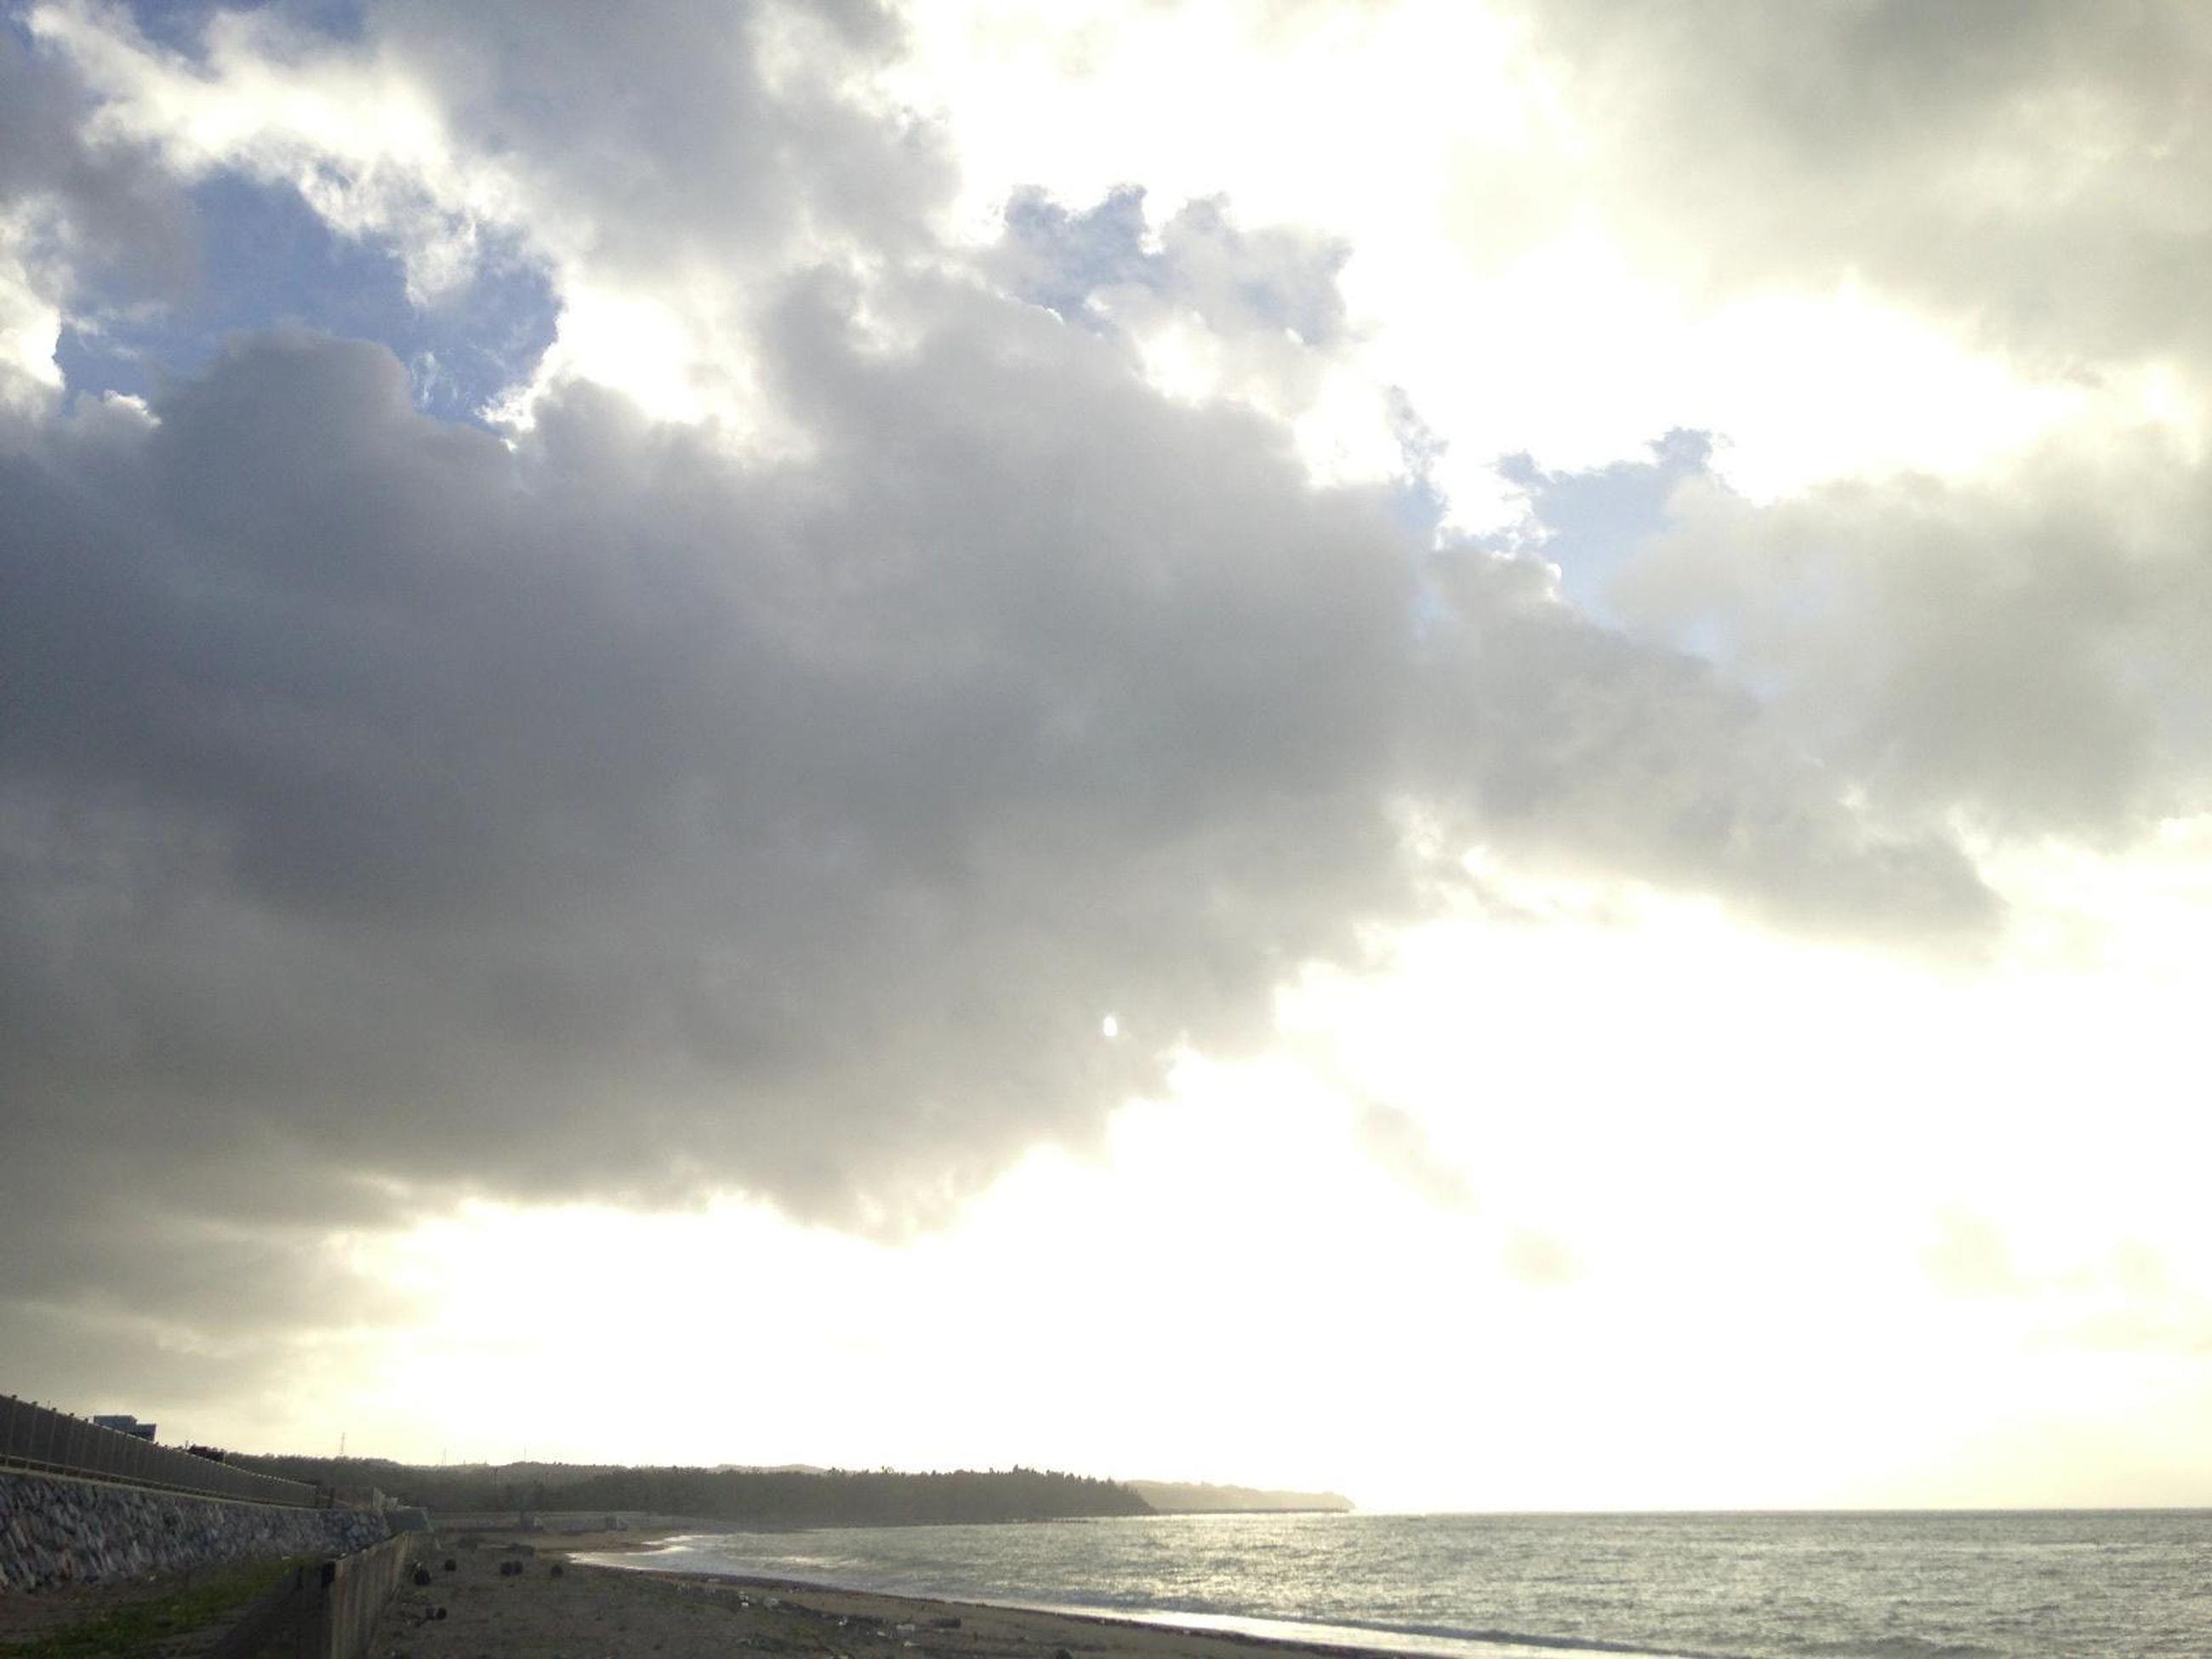 sky, cloud - sky, scenics, sea, tranquil scene, cloudy, tranquility, beauty in nature, sun, sunbeam, cloud, horizon over water, nature, sunlight, water, idyllic, beach, weather, outdoors, overcast